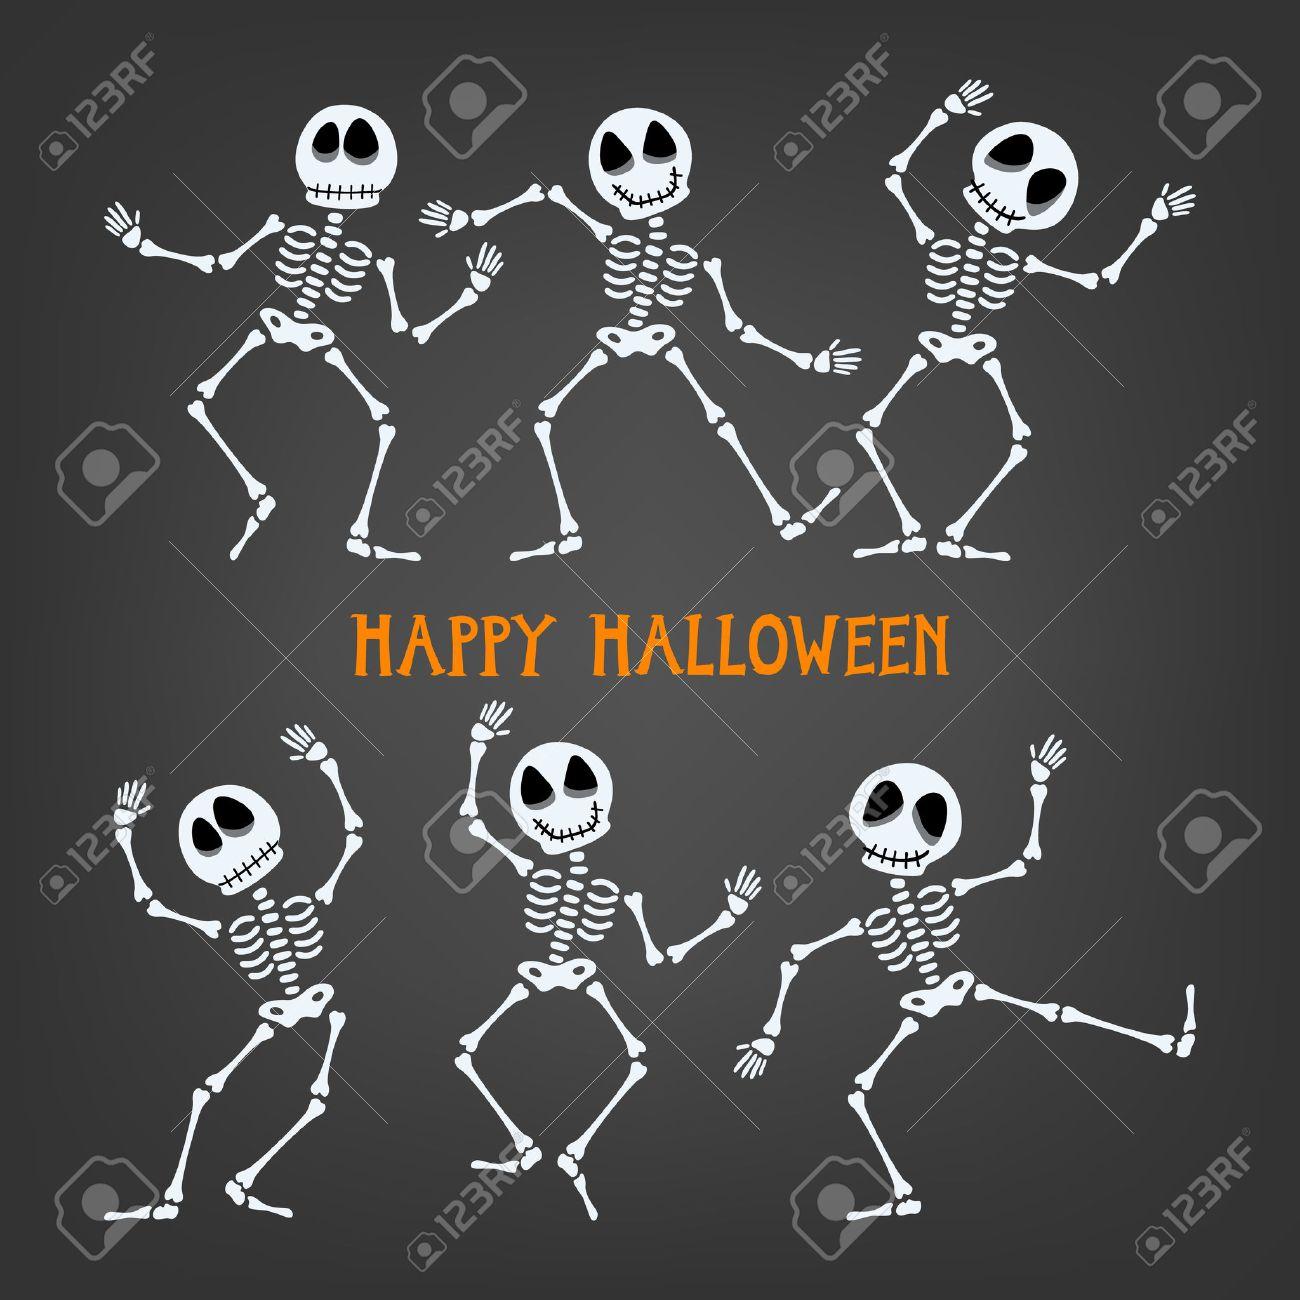 Set of dancing skeleton. Halloween skeleton with assorted expressions. Vector illustration. - 47258887